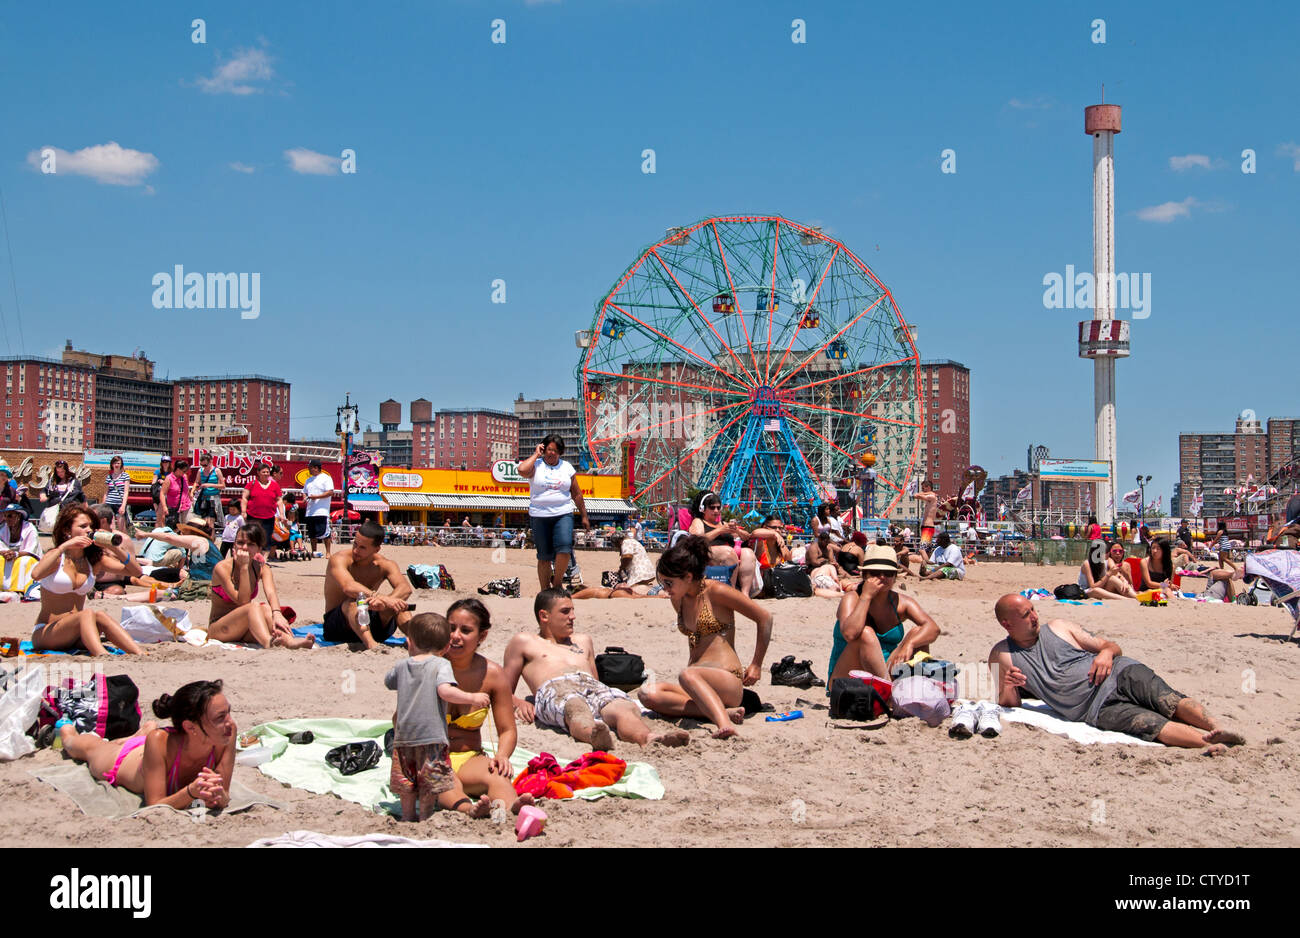 Deno's Wonder Wheel Amusement park Coney Island Luna Beach Boardwalk Brooklyn New York - Stock Image